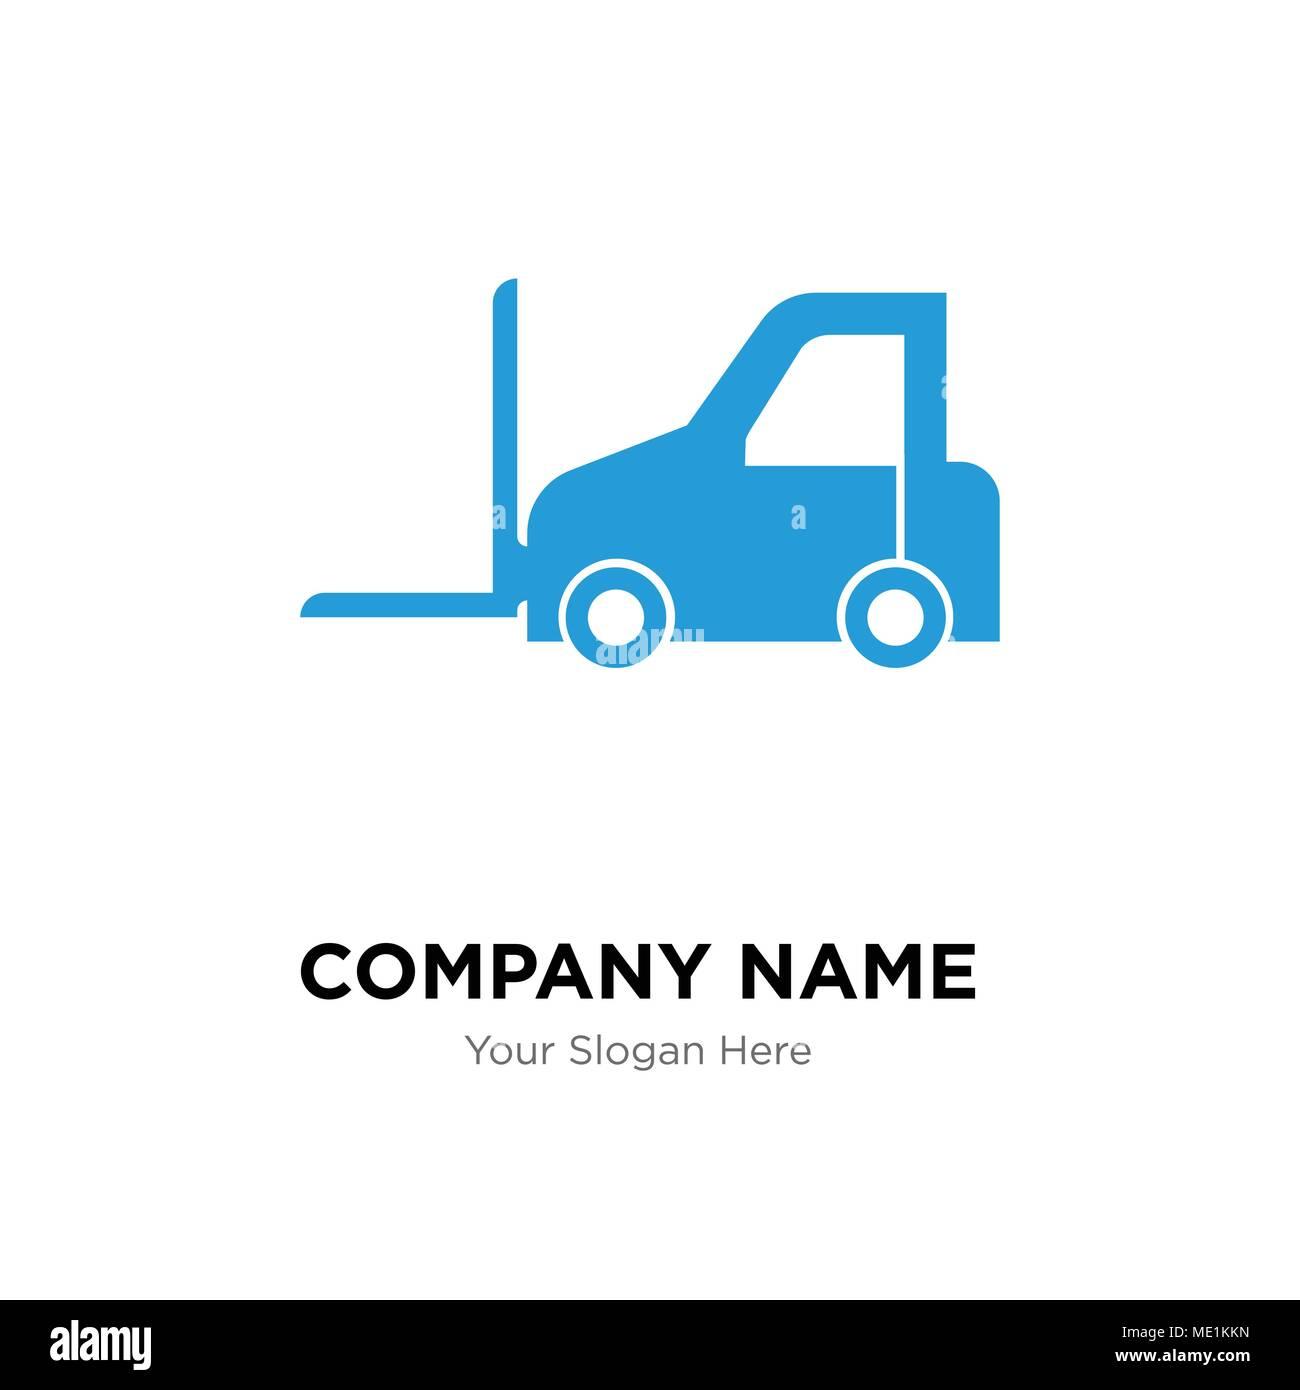 Logistics transport company logo design template, Business